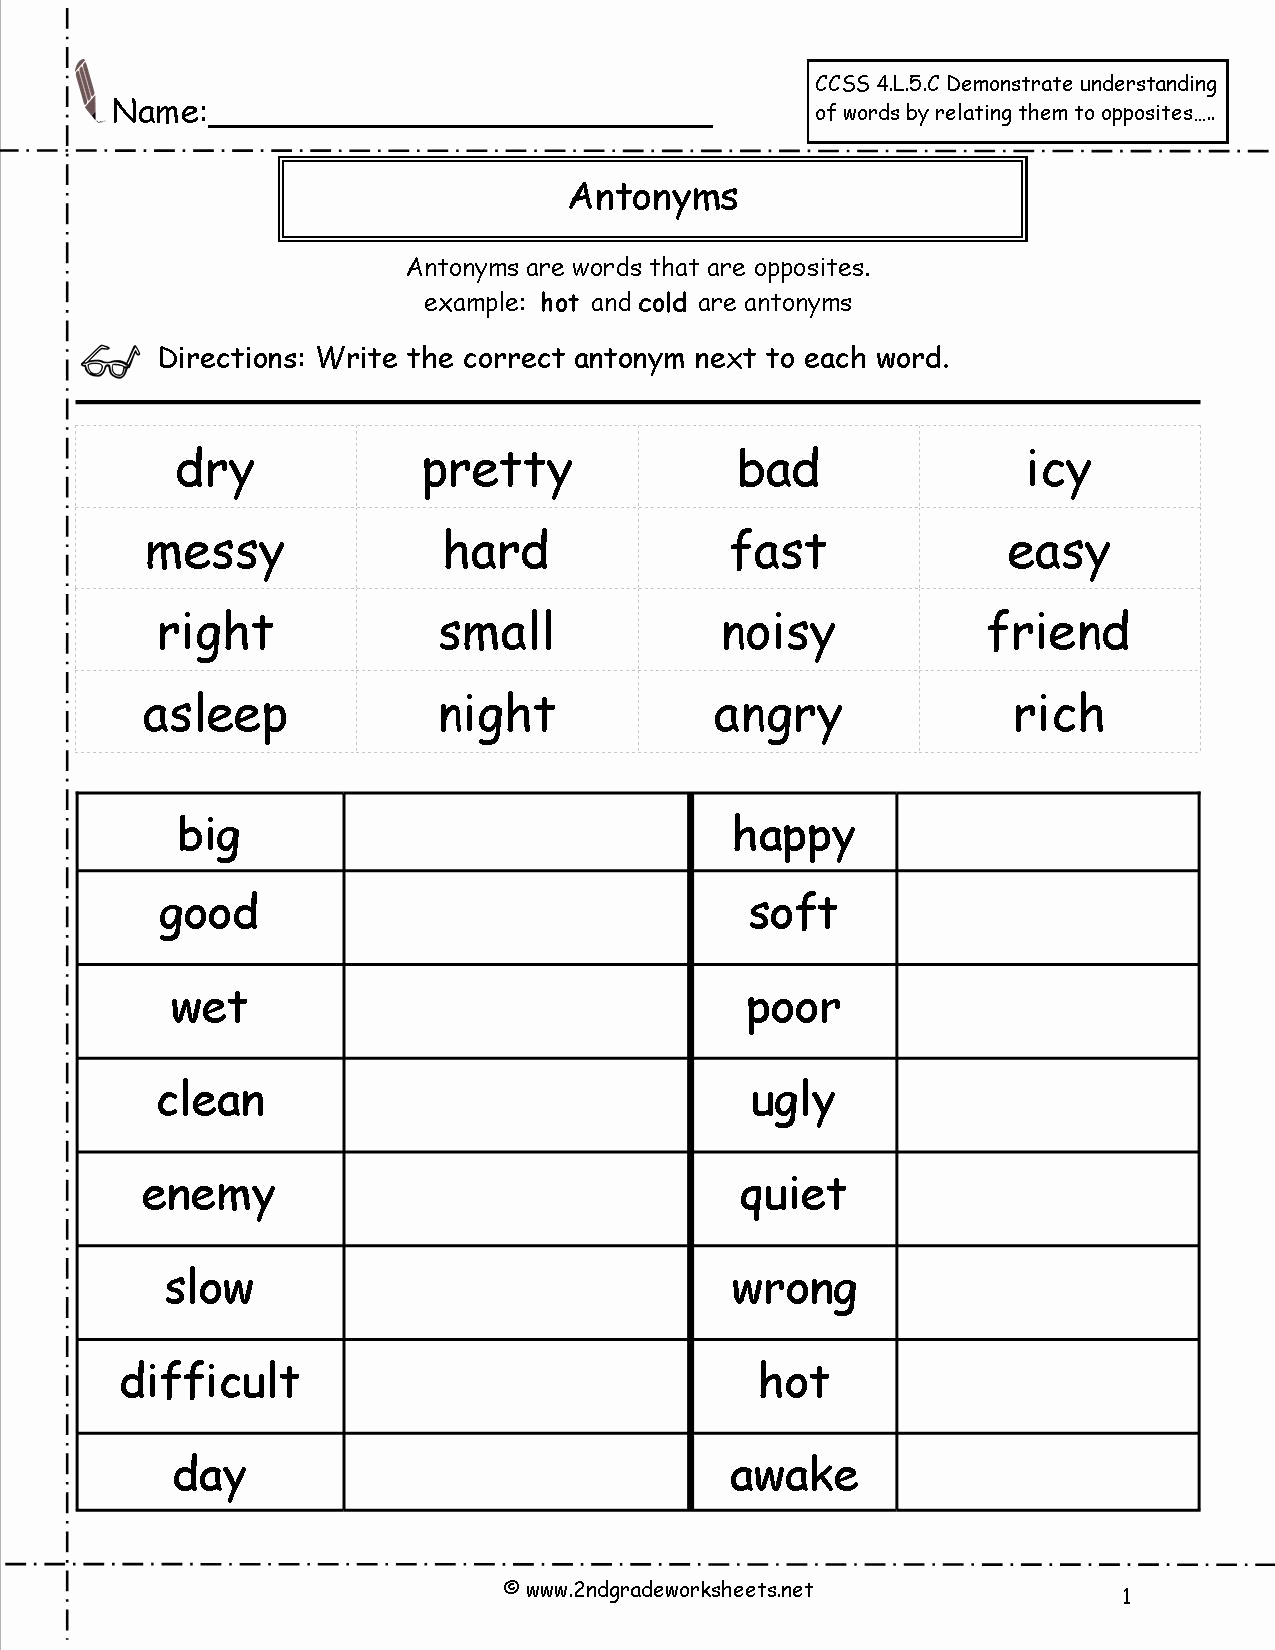 Context Clues Worksheets Second Grade Fresh Context Clues Worksheet Writing Part 1 Intermediate